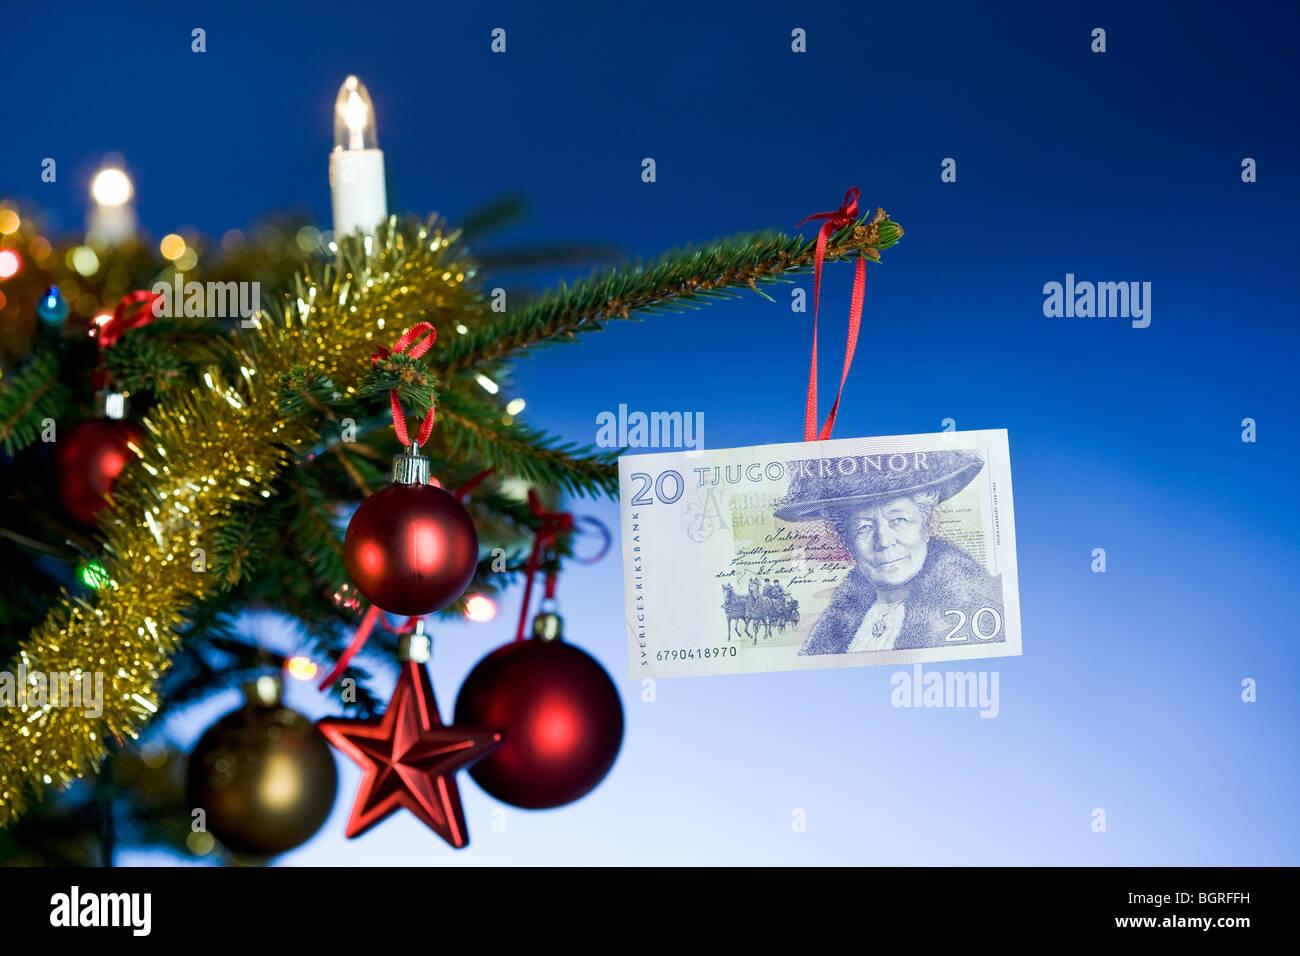 Christmas Tree Bill.Bill Hanging In A Christmas Tree Stock Photo 27561957 Alamy